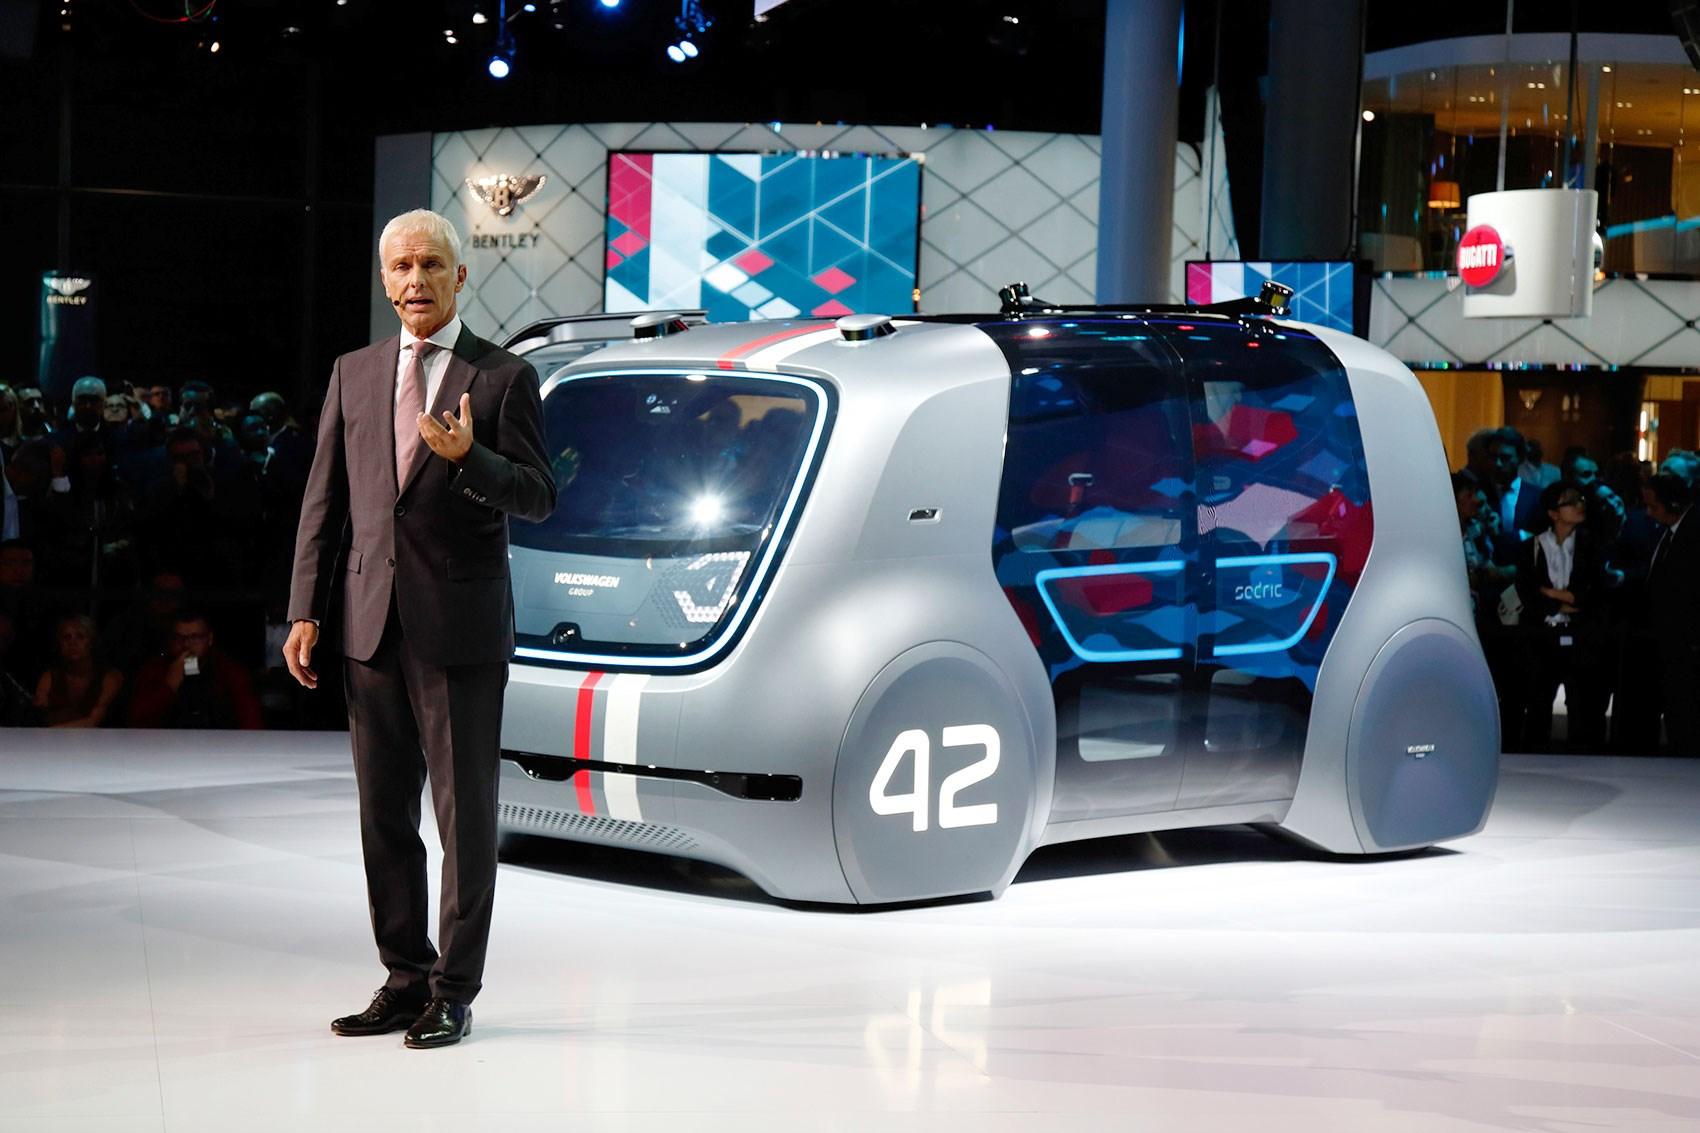 VW's Bold RoadMap E Strategy Revealed At Frankfurt Motor